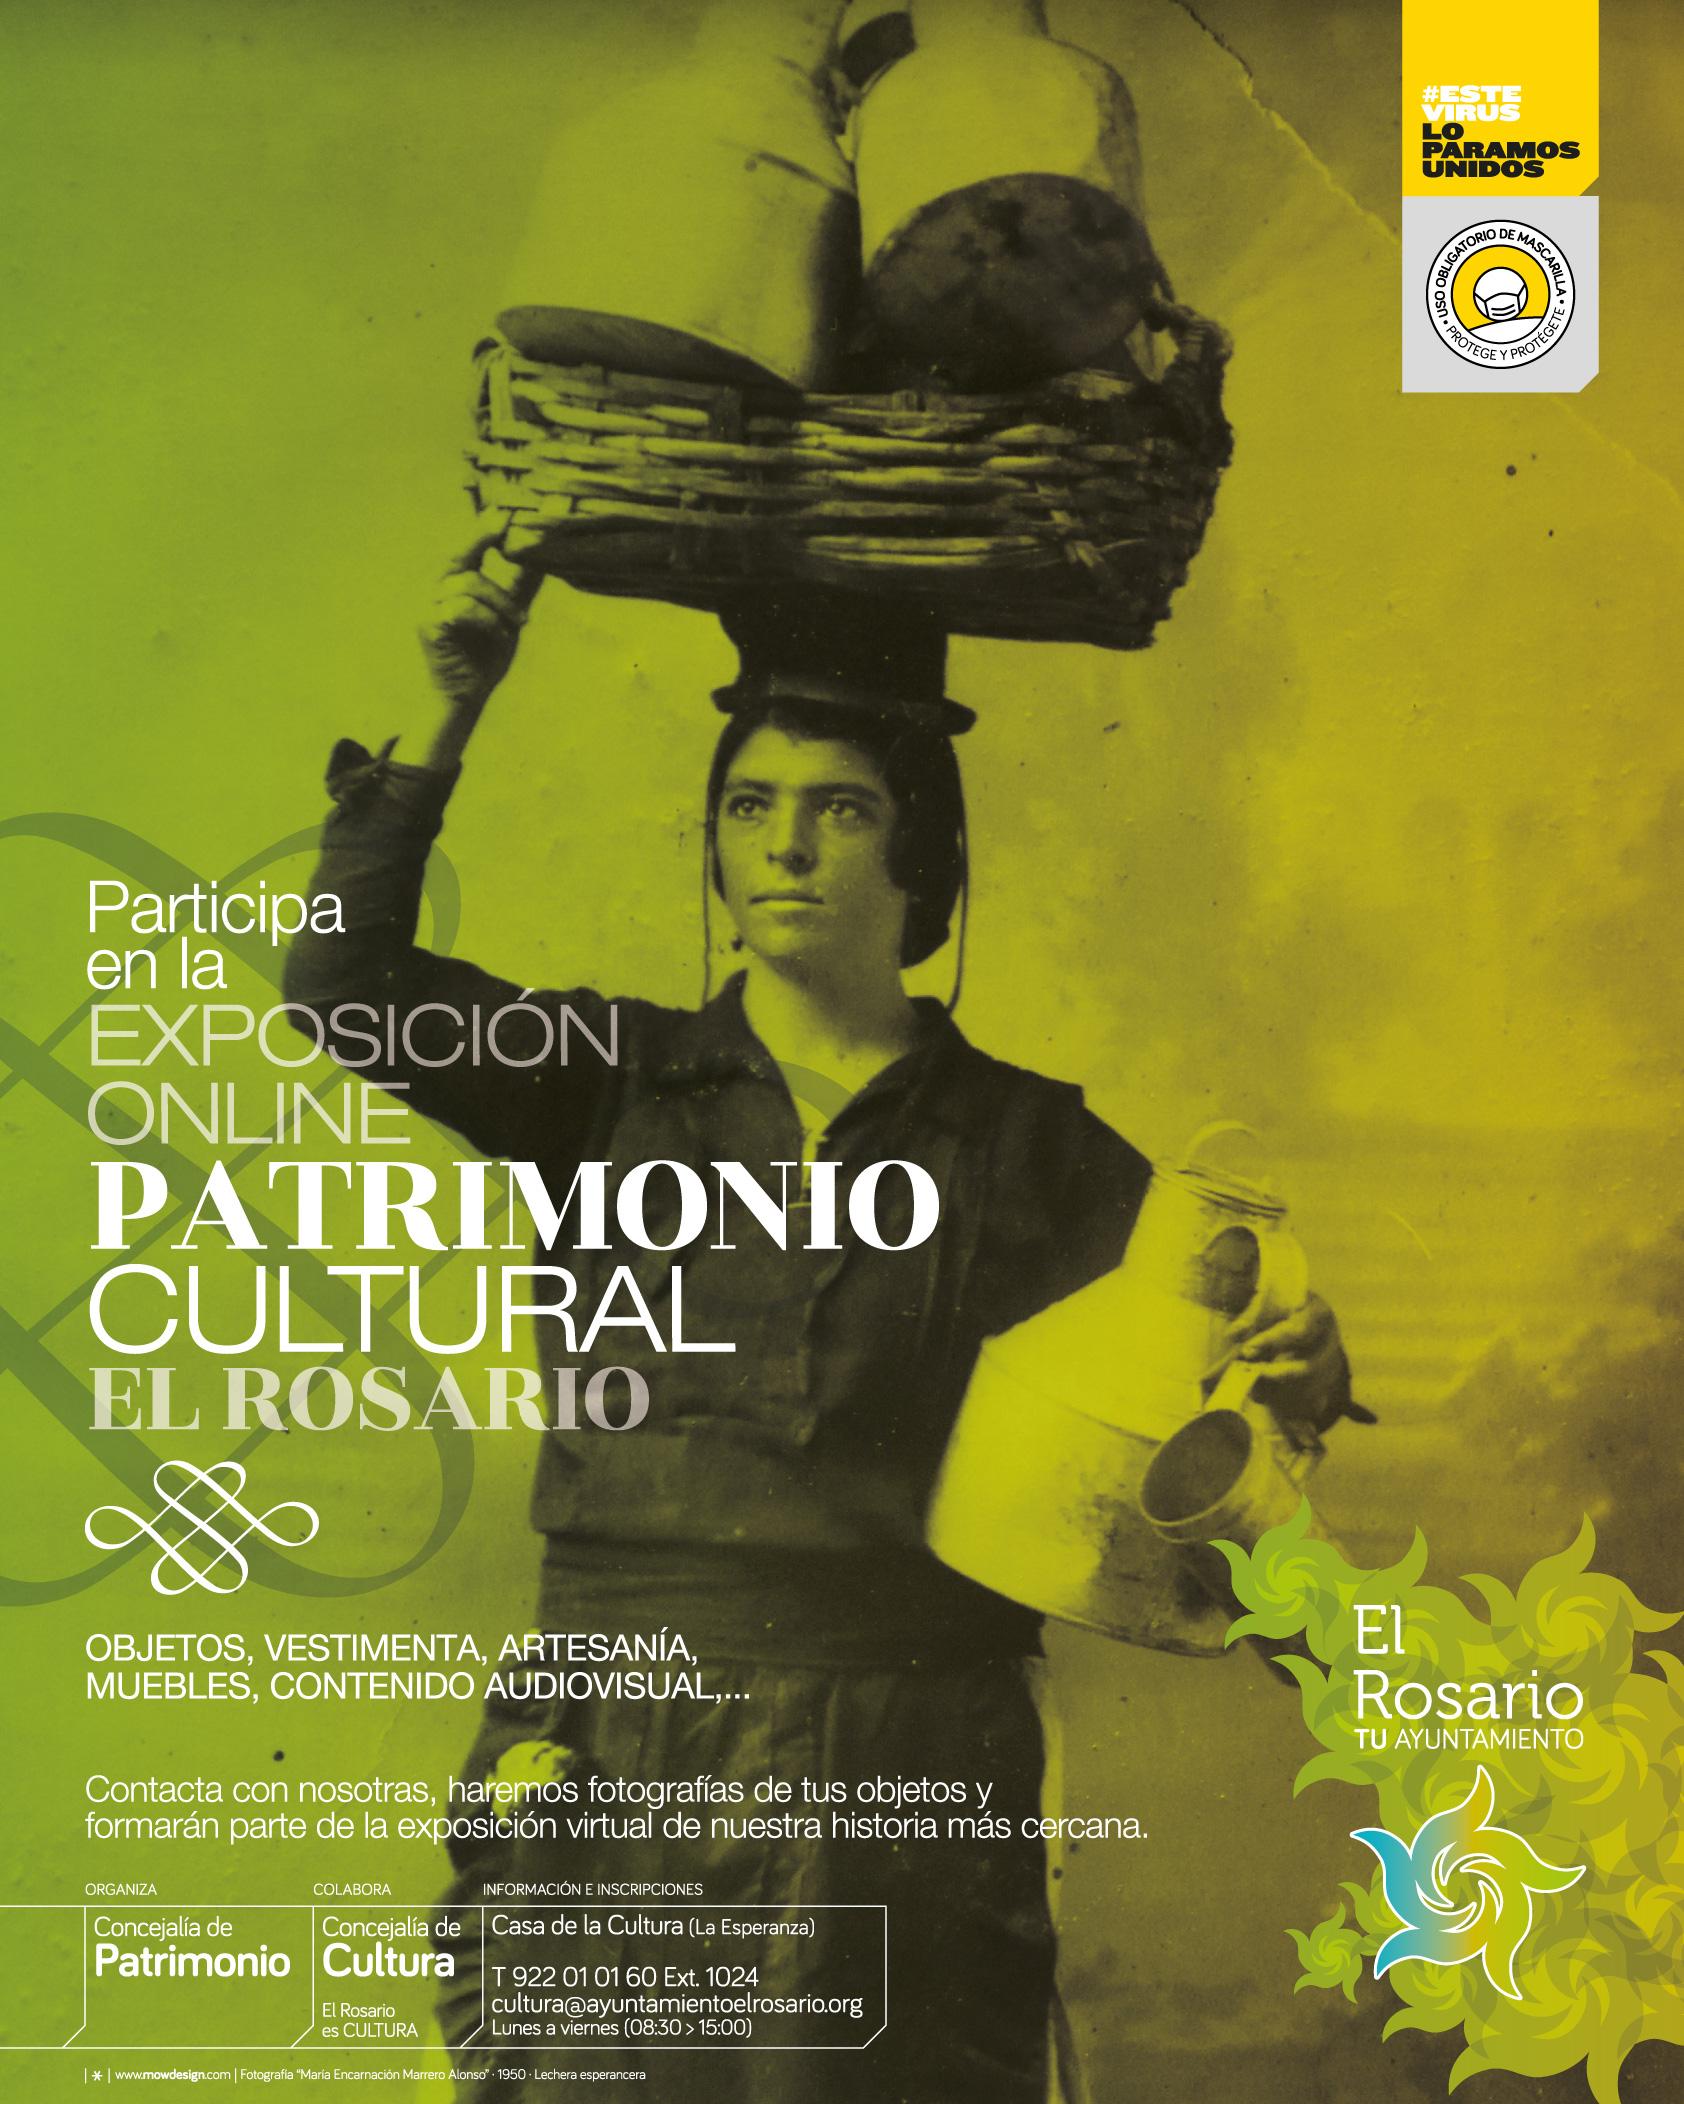 CATALOGO_PATRIMONIO_CULTURAL-20210000-CARTEL_A3-20210210-02af-redes